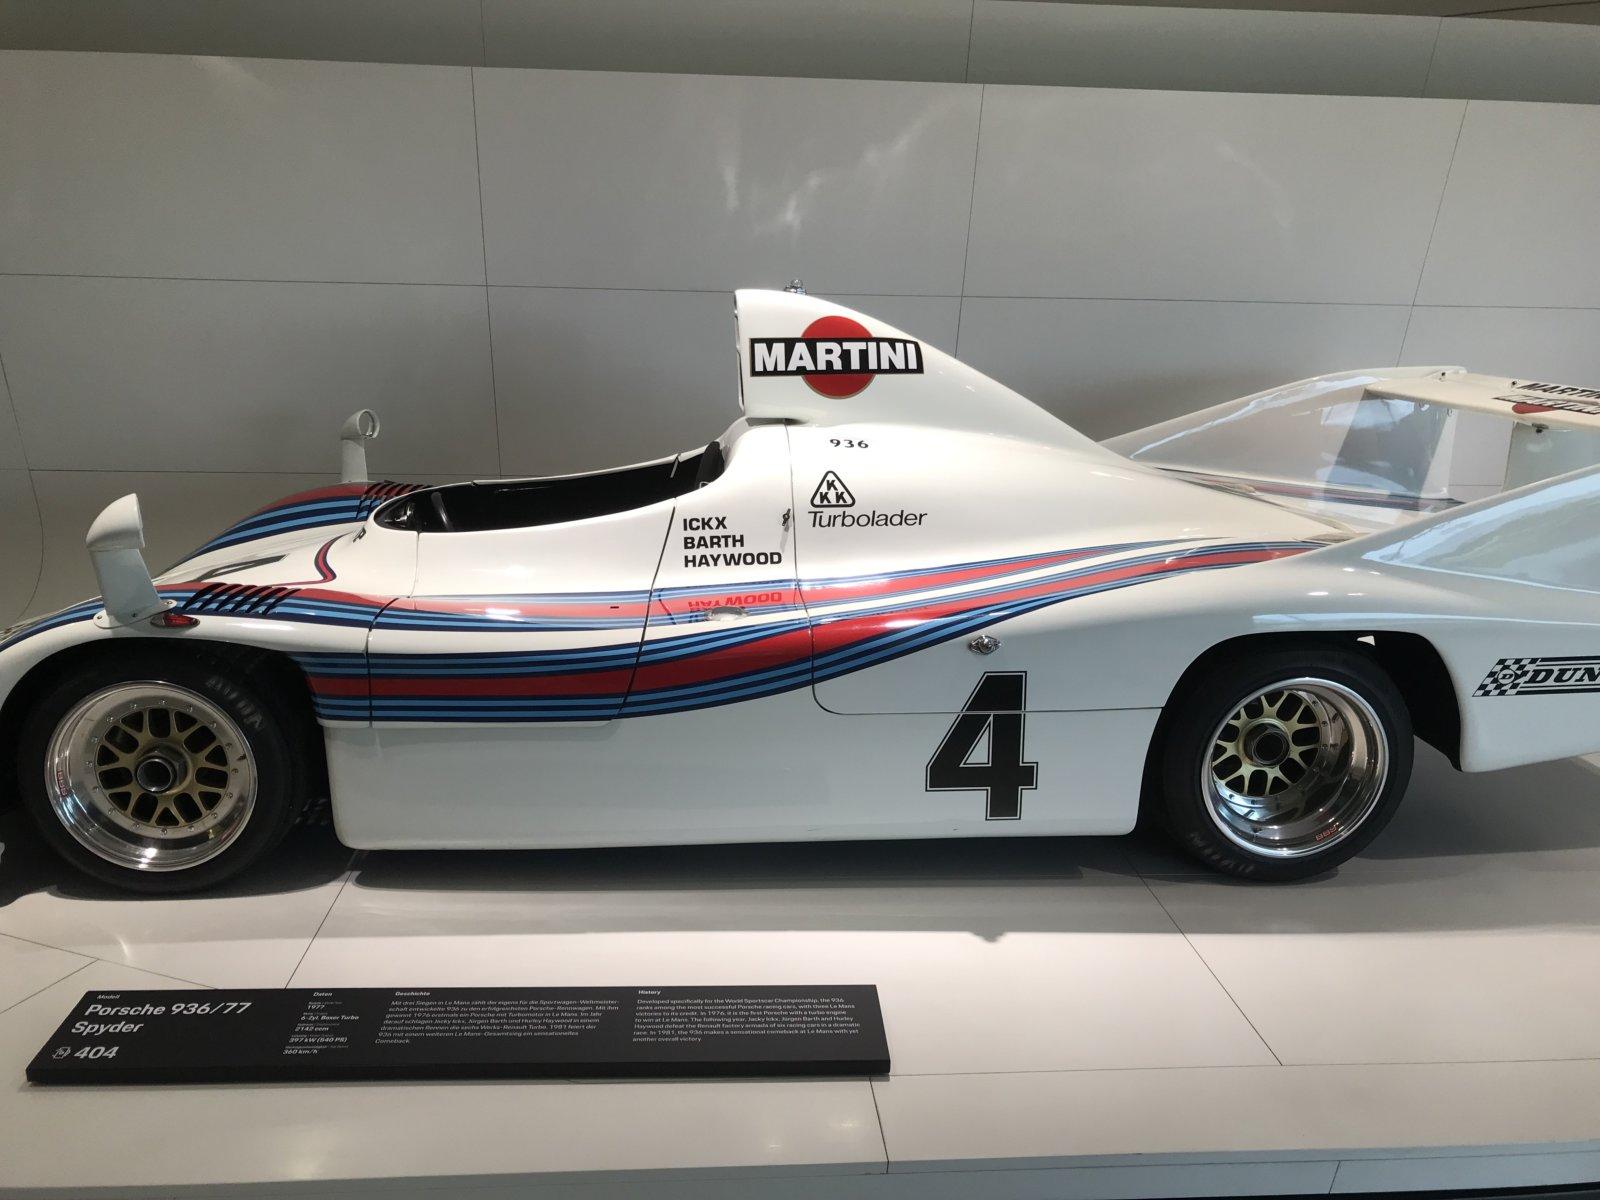 07-28 Porsche Race Car 07